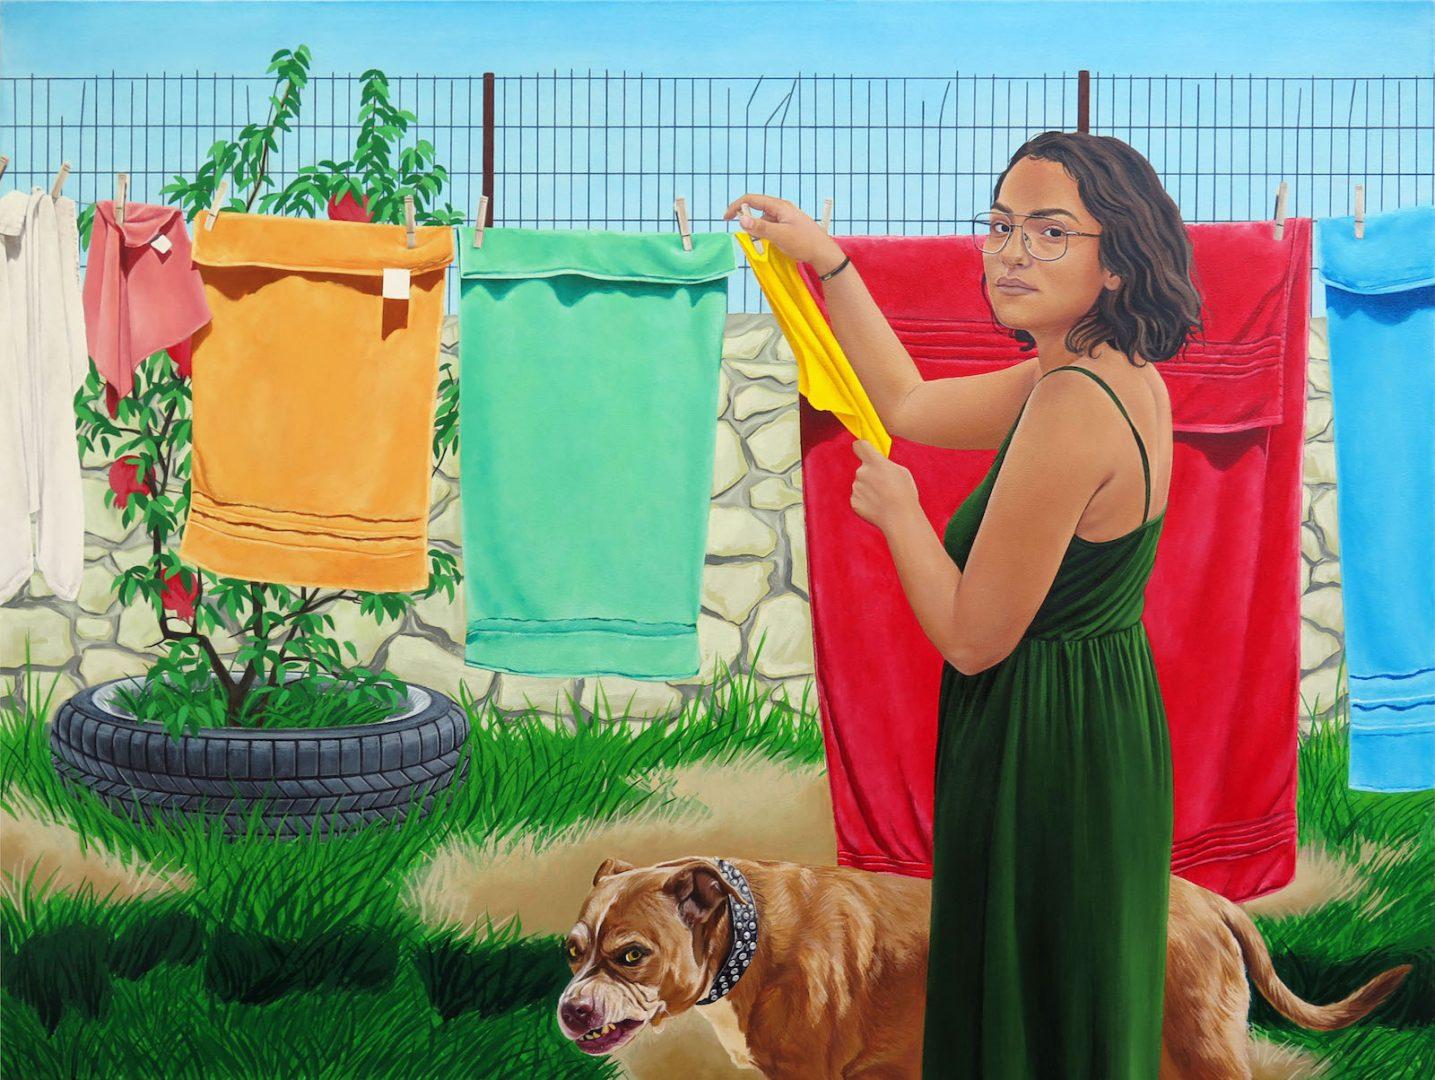 Marianna Olague, Perro Bravo, 2018, Acrylic and oil on canvas, 36 x 48 in